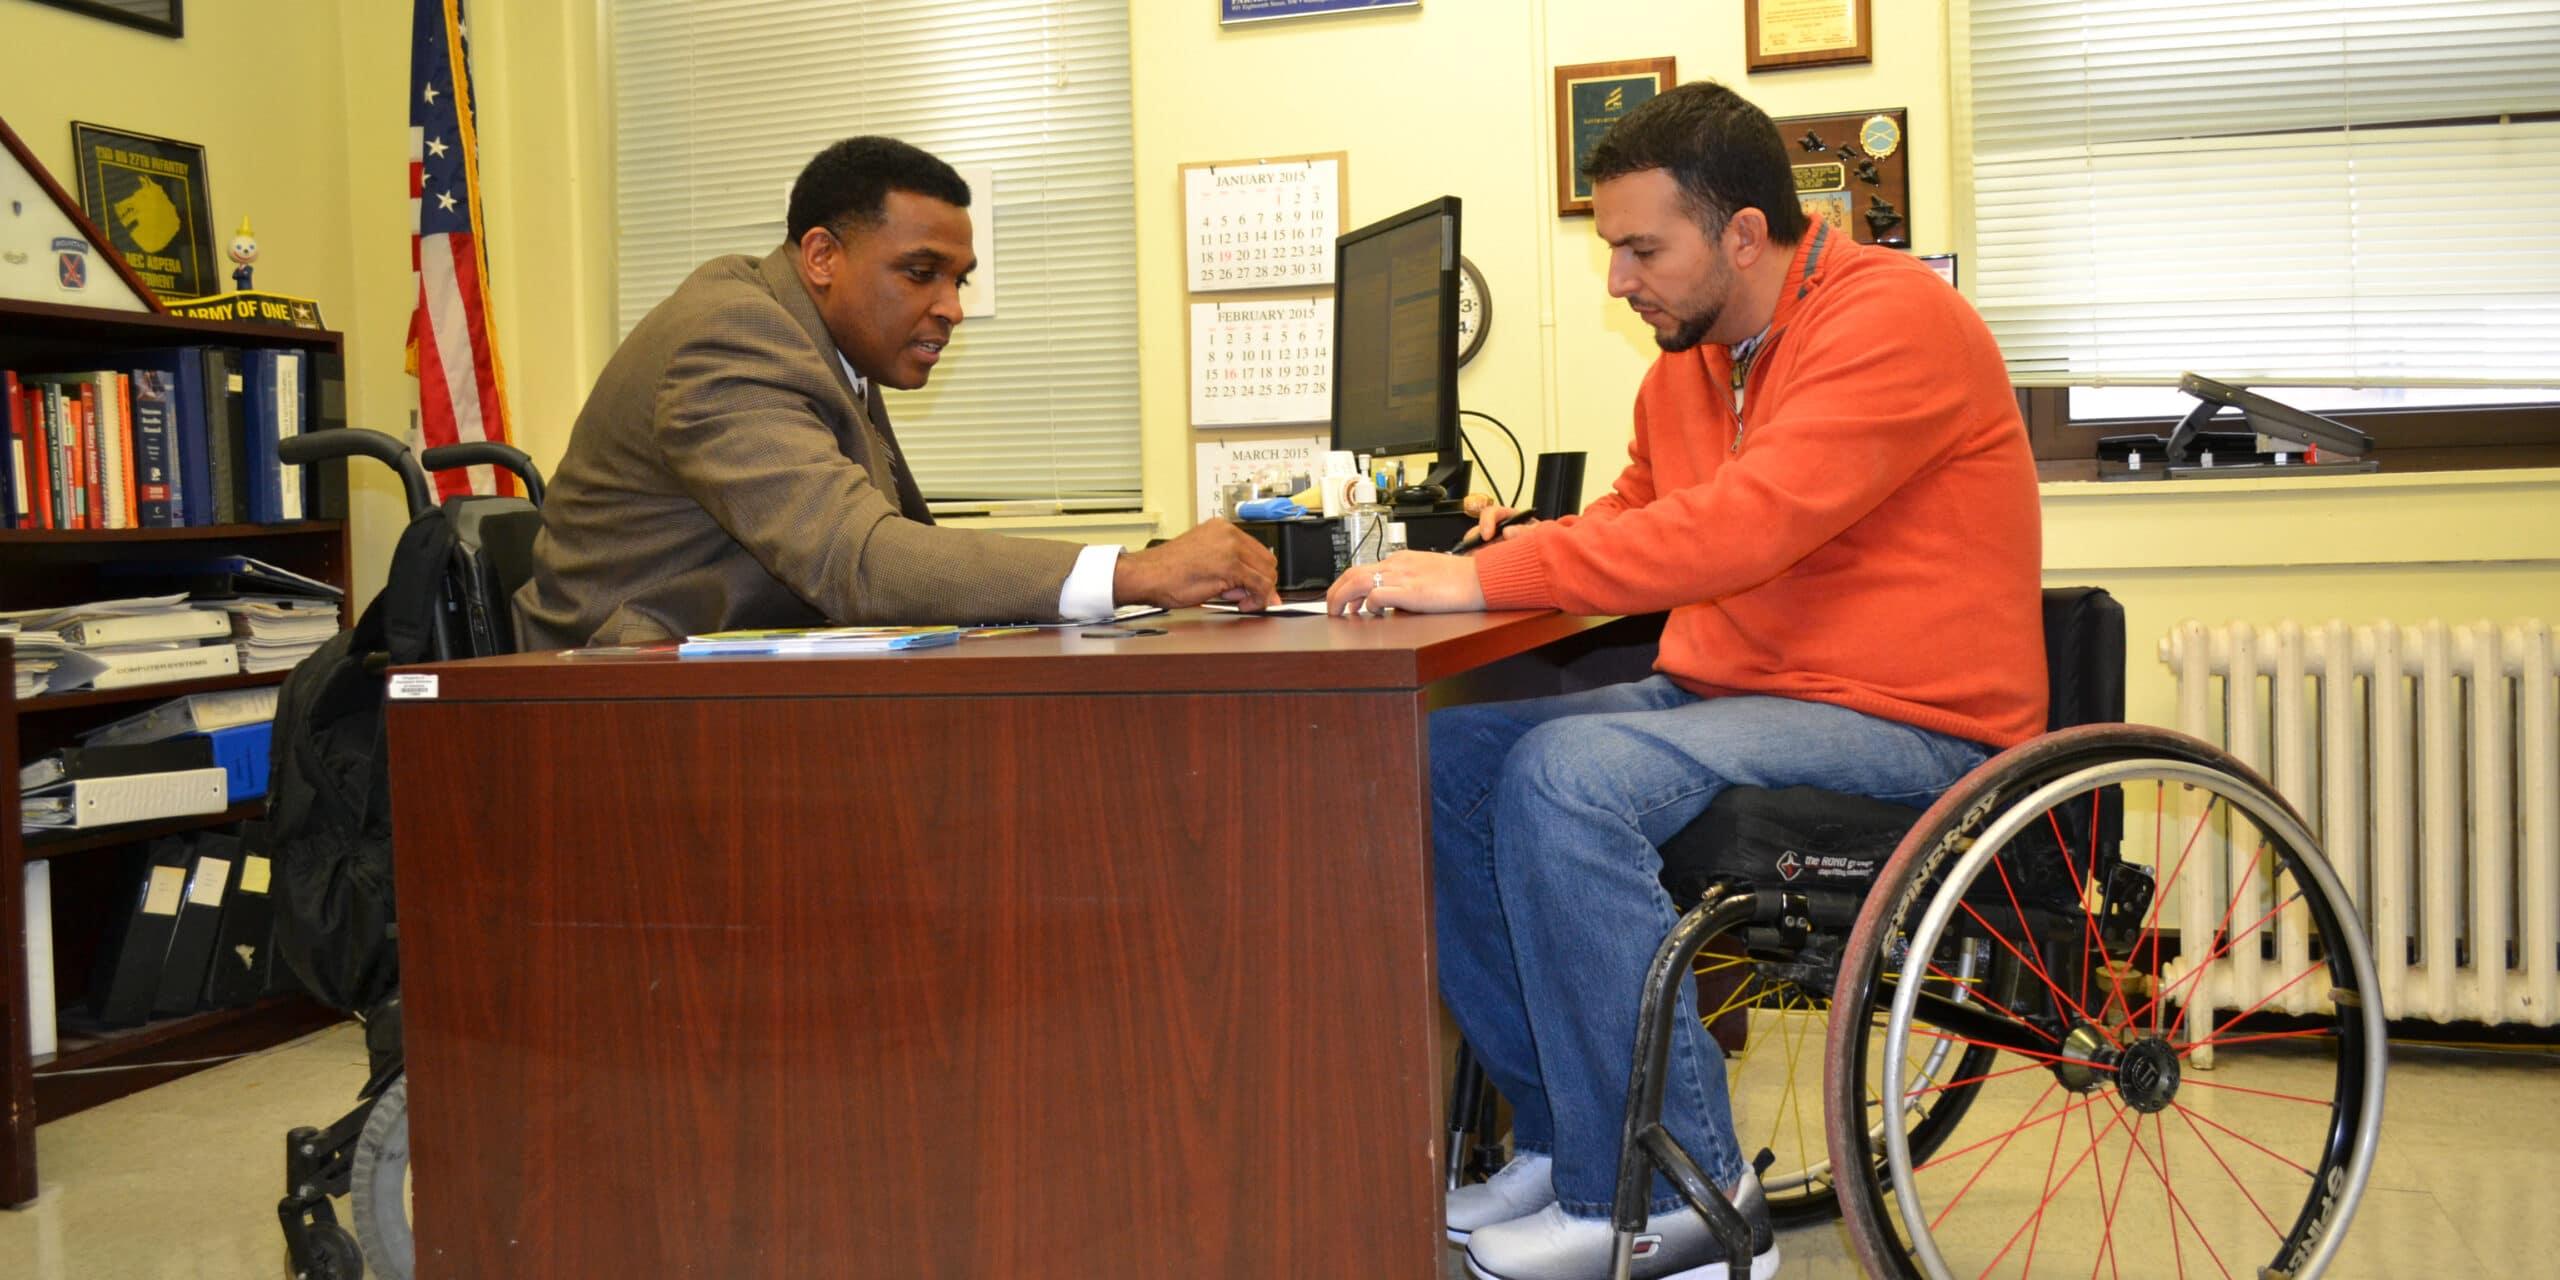 Paralyzed Veterans of America member Alberto Velasco and his PVA National Service Officer